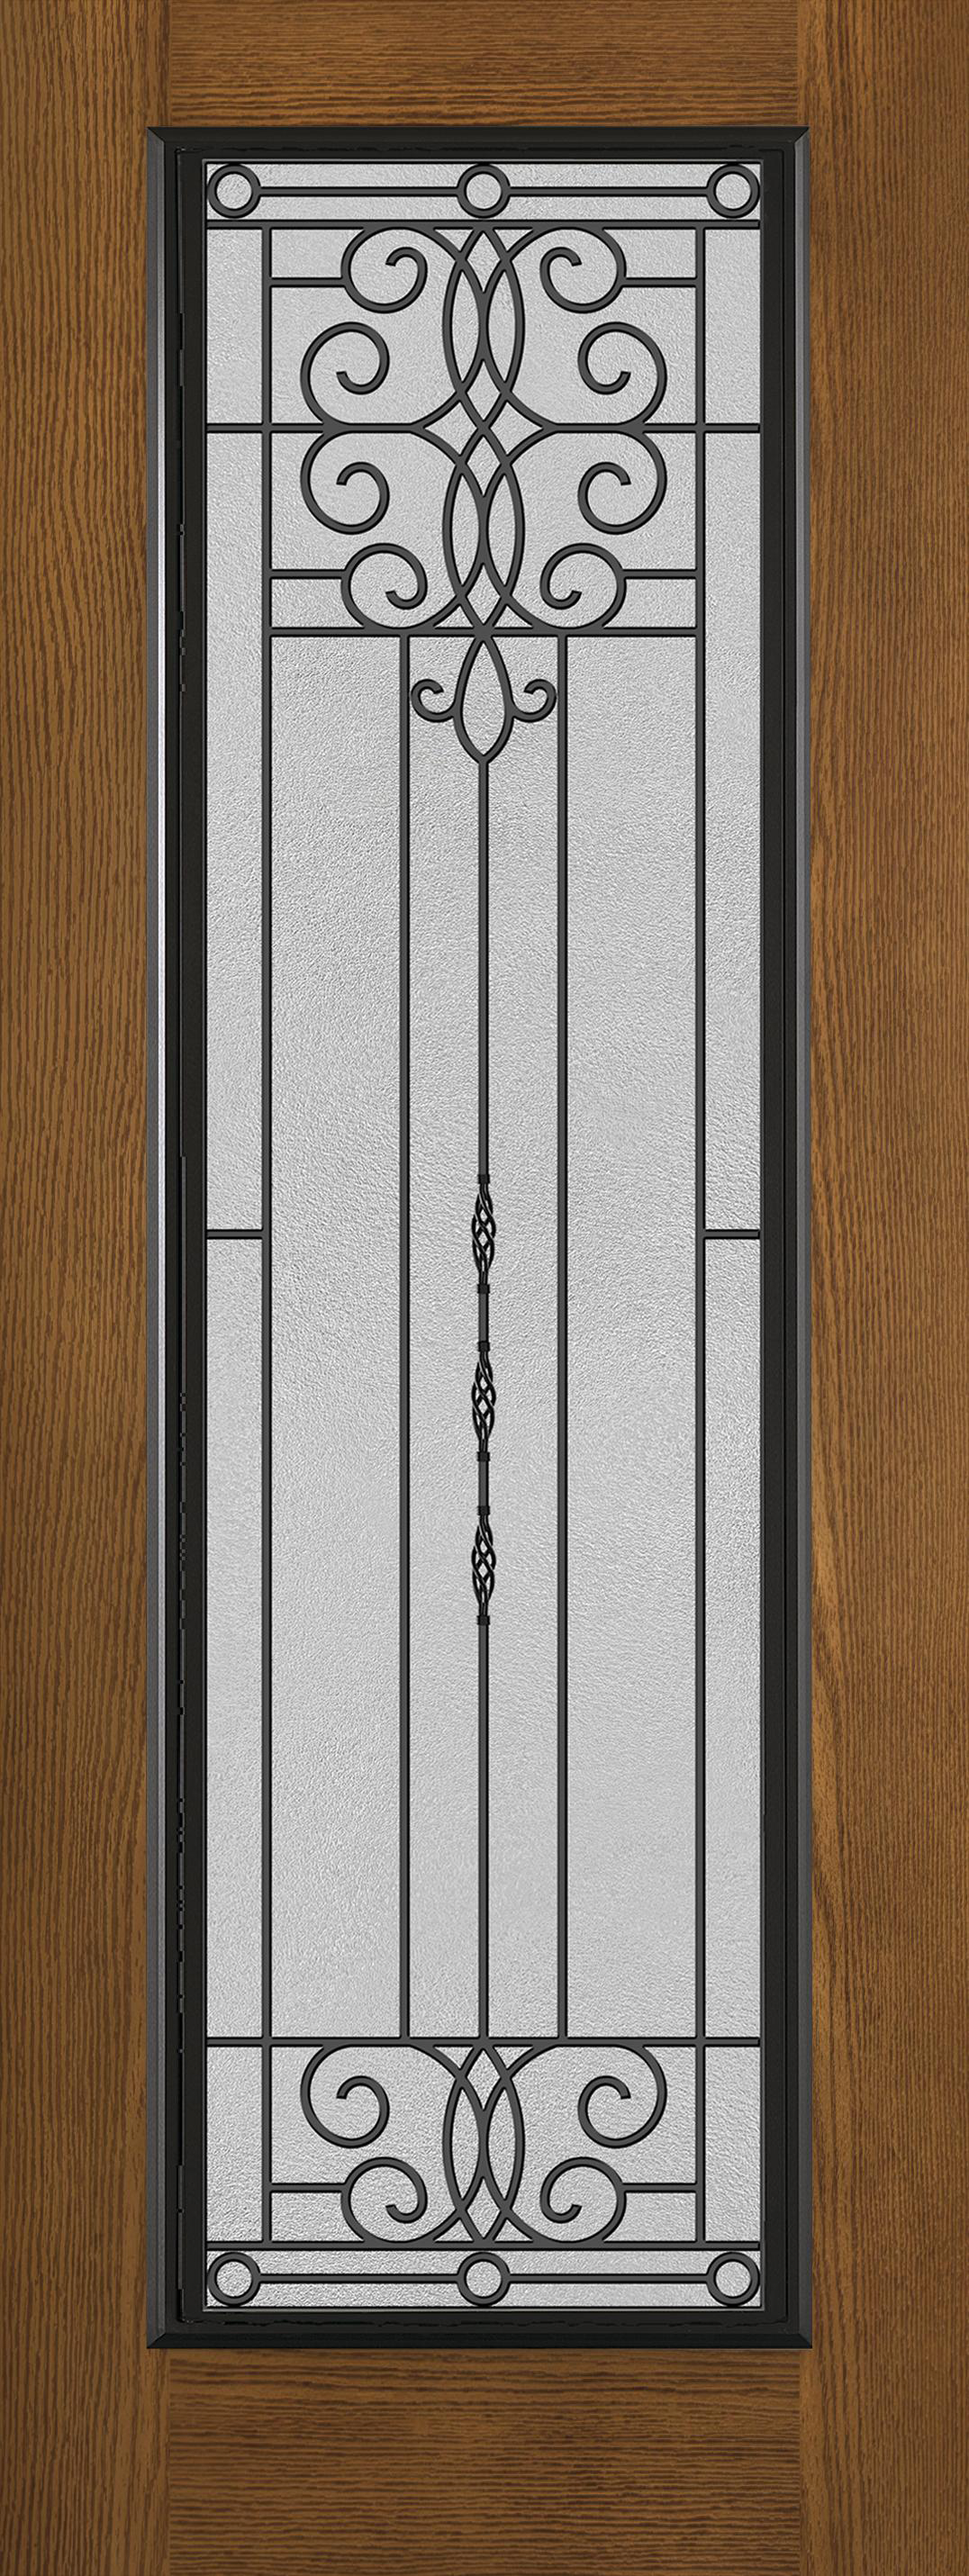 Design pro fiberglass glass panel exterior door jeld wen doors design pro fiberglass glass panel exterior door jeld wen doors windows eventelaan Gallery